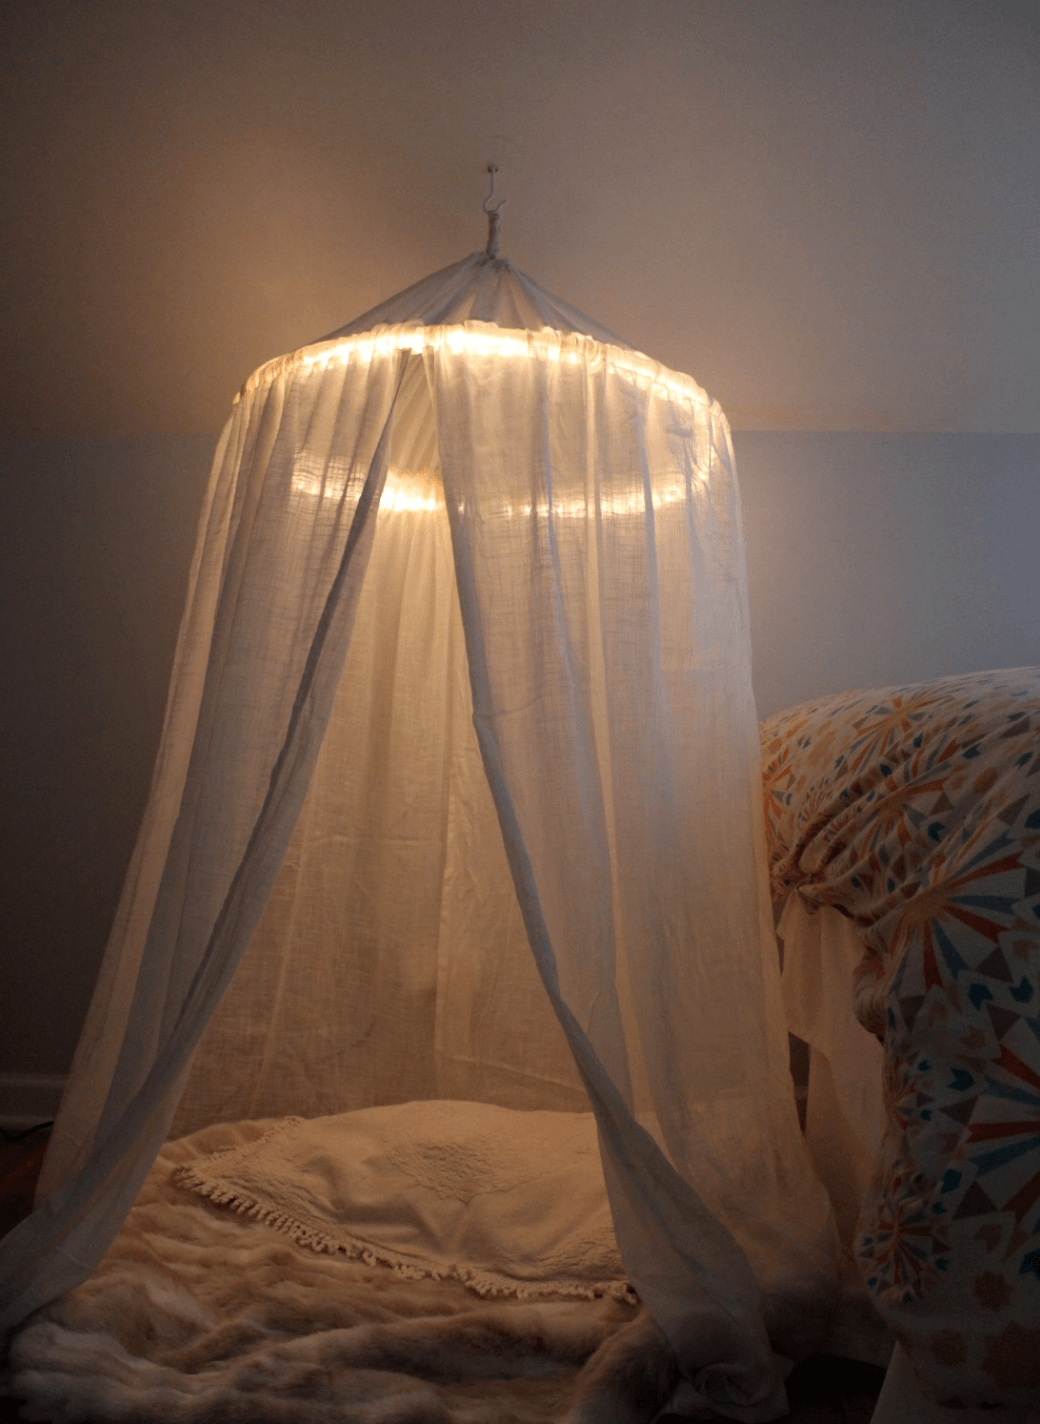 DIY Hula Hoop Canopy